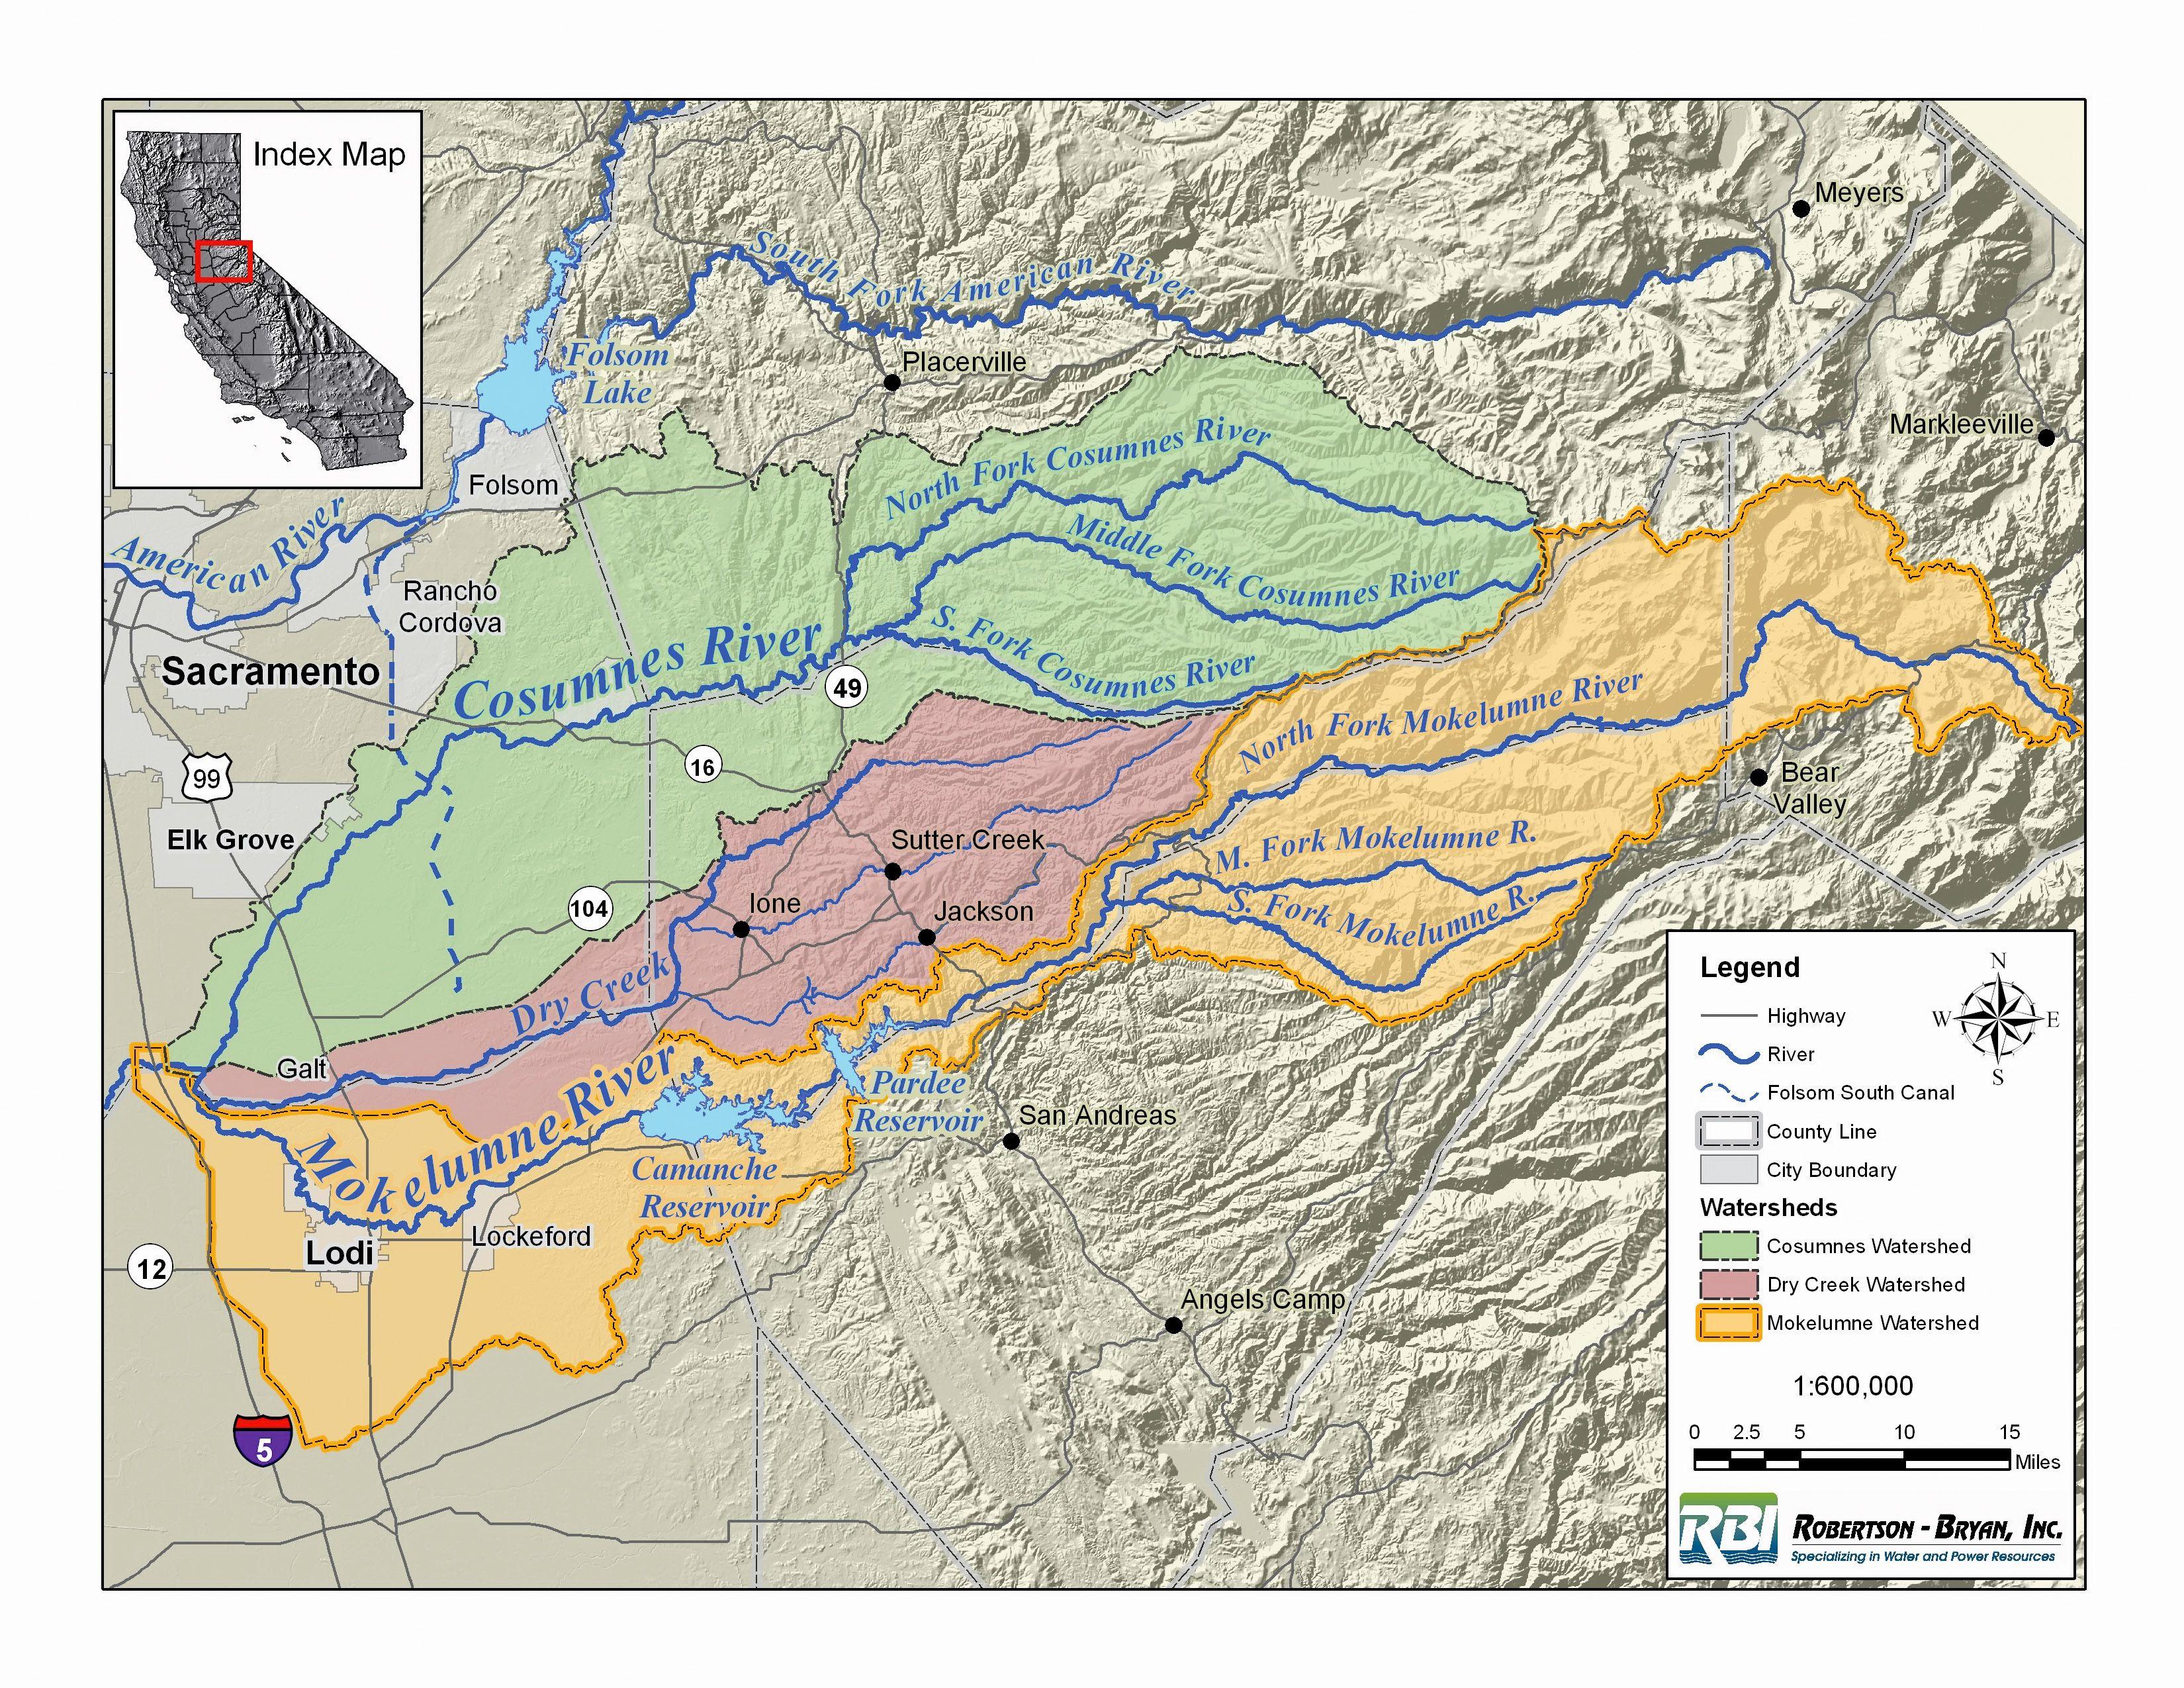 Big Bear California Map Google.Mokelumne River Map Google Search Mokelumne River In 2019